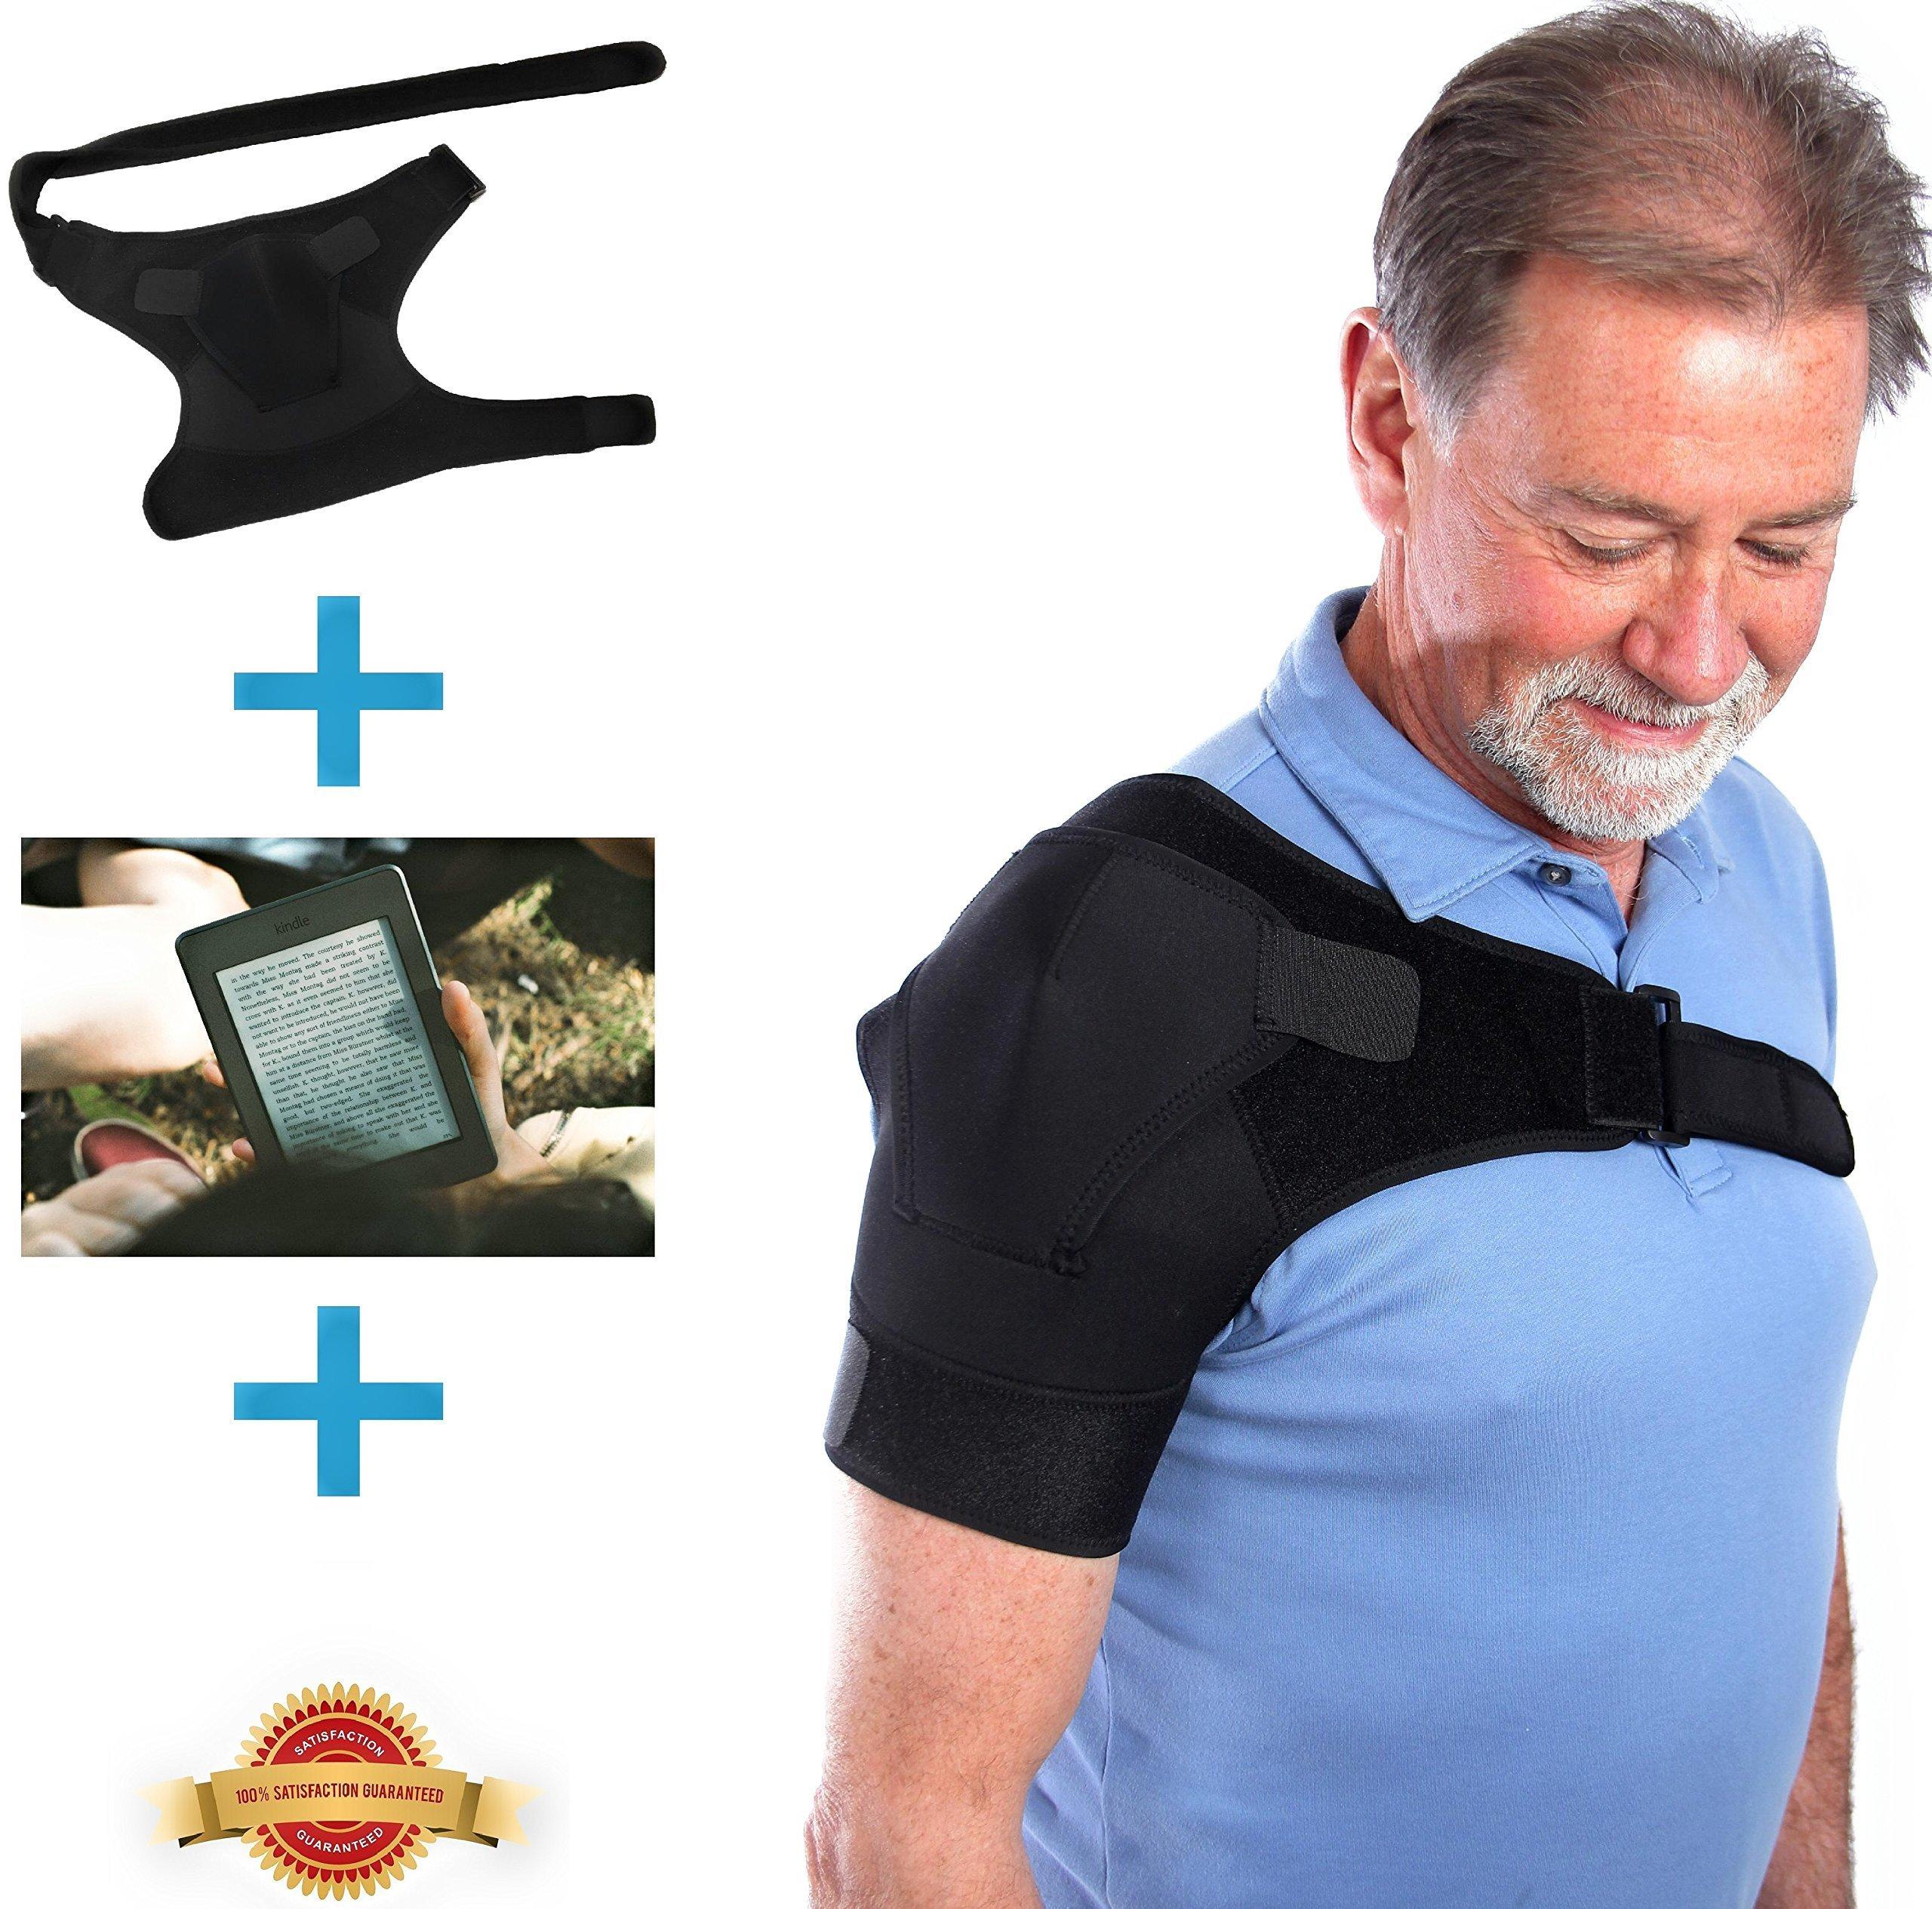 Fully Adjustable Shoulder Stability Brace for Your Injured Shoulder, Free eBook Included, Hot/Cold Pack Pocket, Unisex Shoulder Brace for Rotator Cuff, AC Joint, Instability, Tendonitis, Arthritis